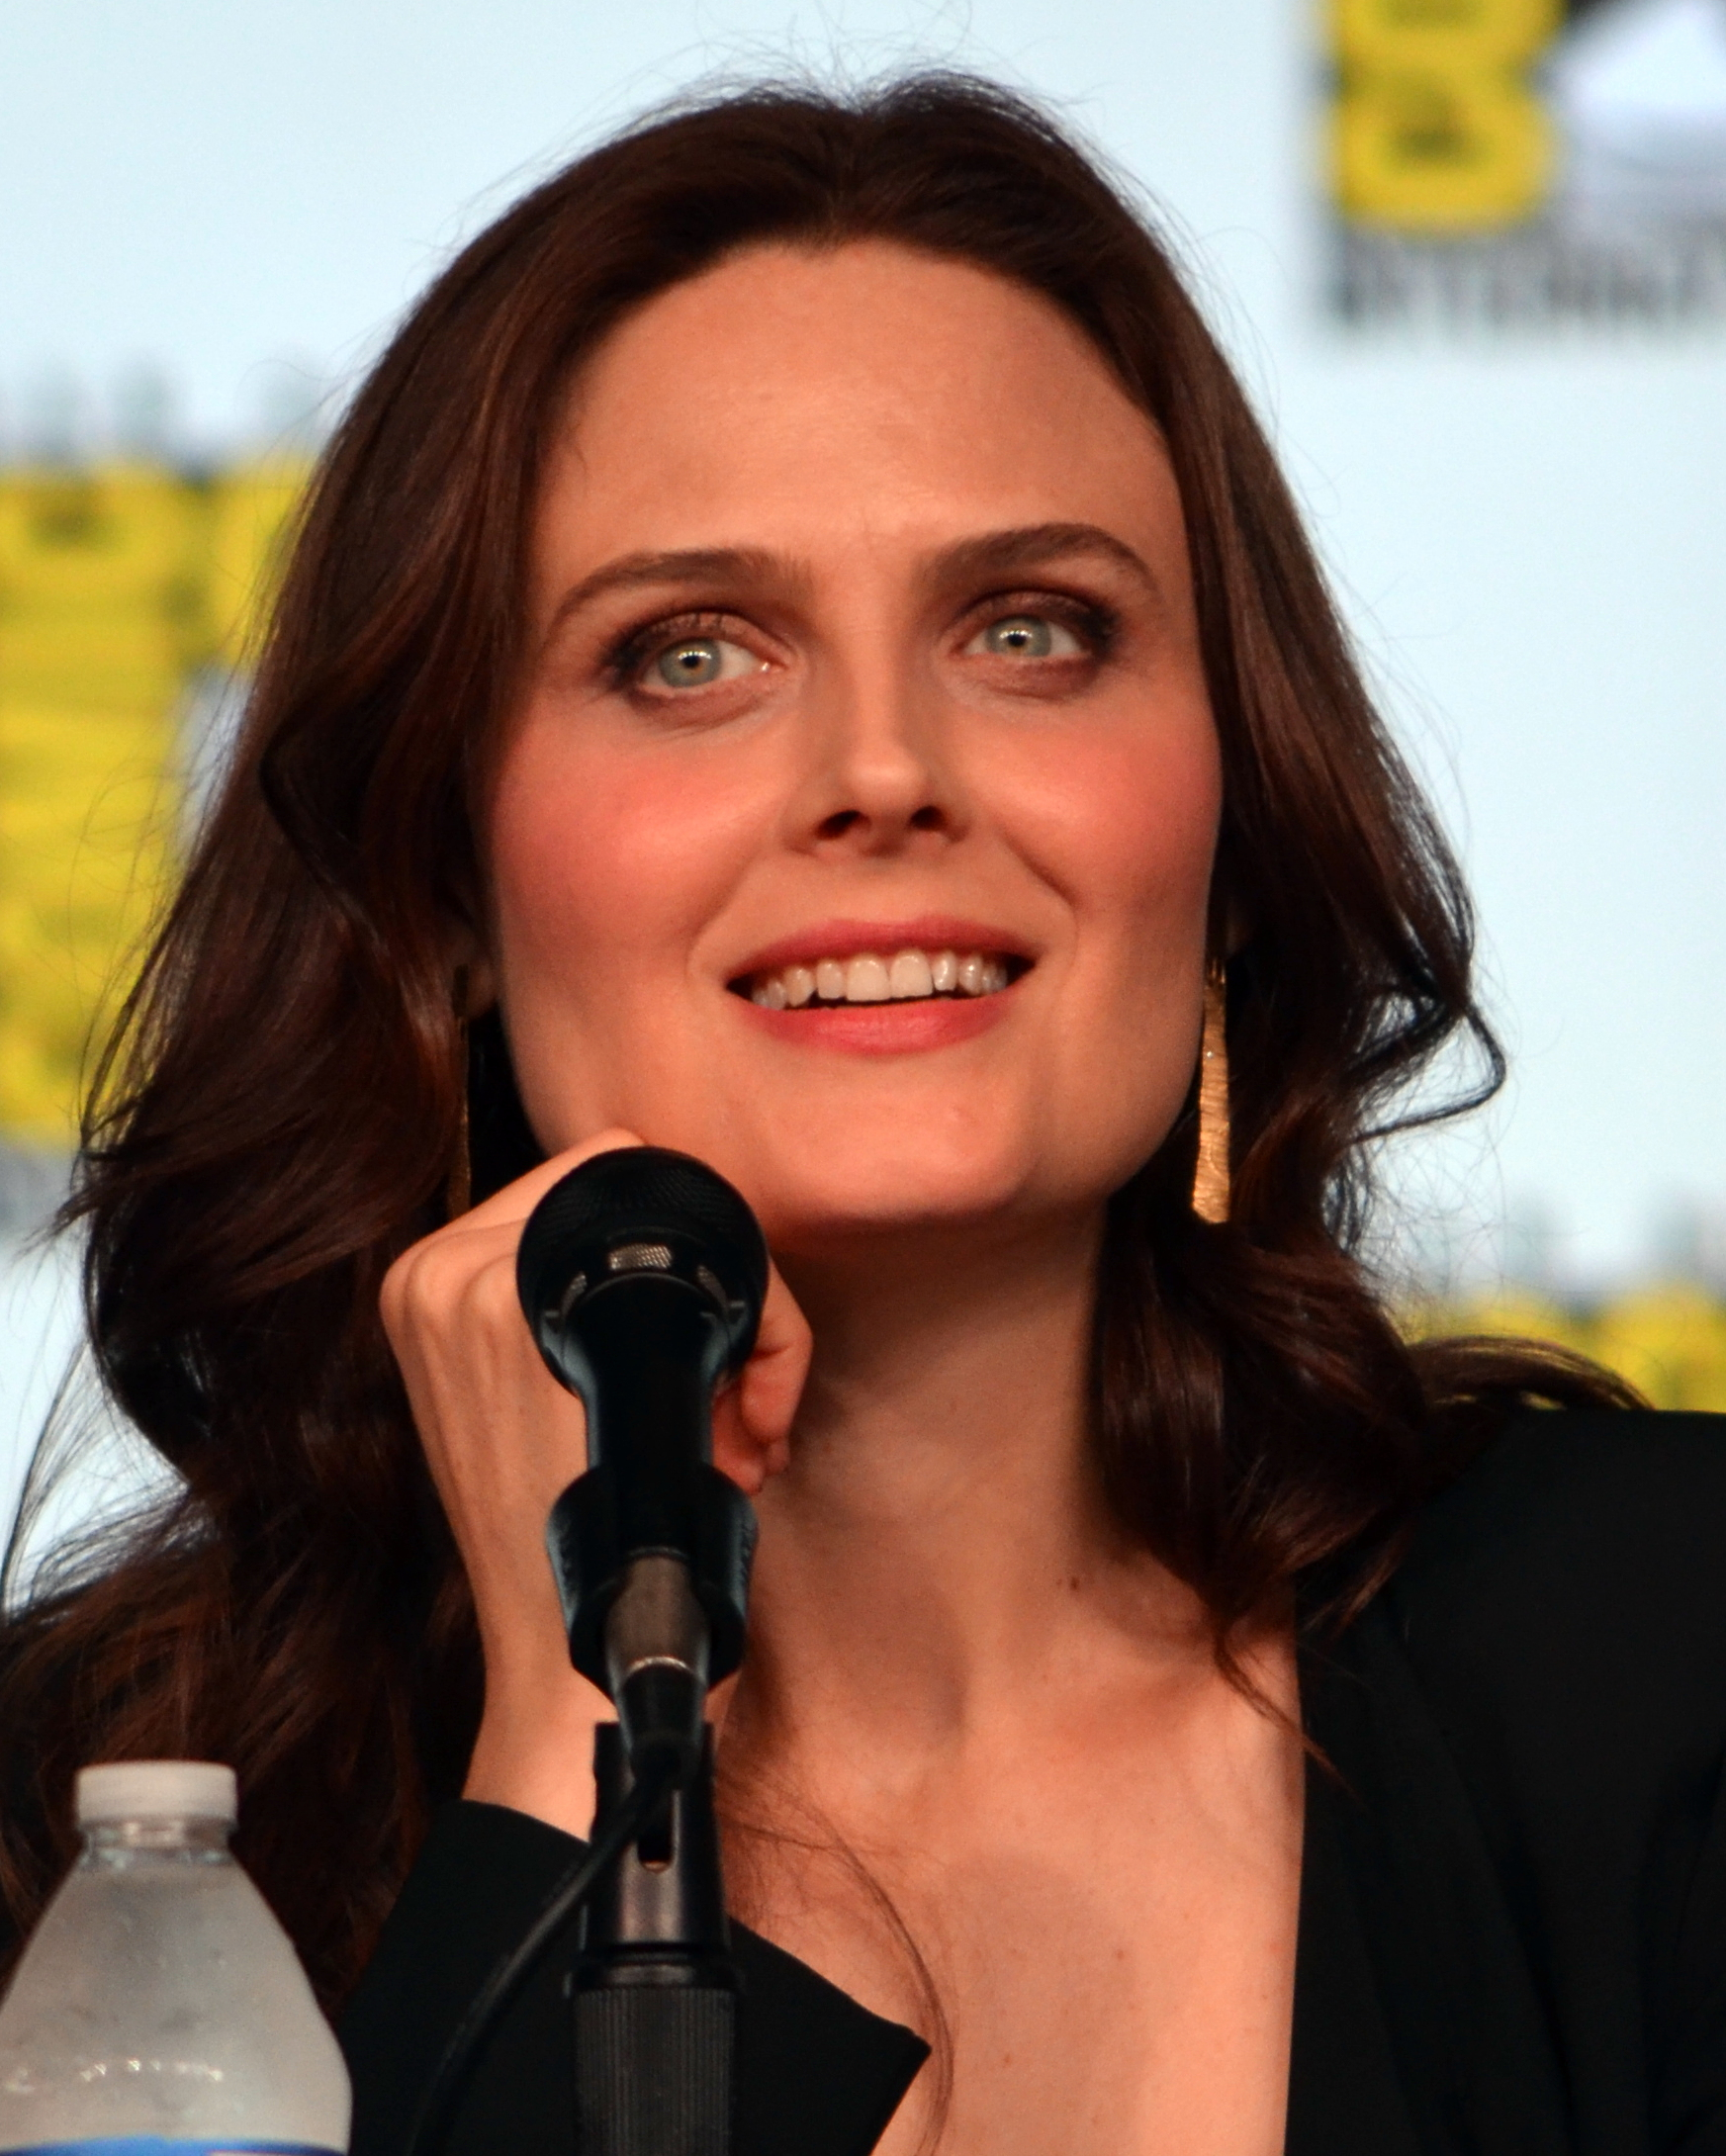 File:Emily Deschanel Comic-Con 2012.jpg - Wikimedia Commons